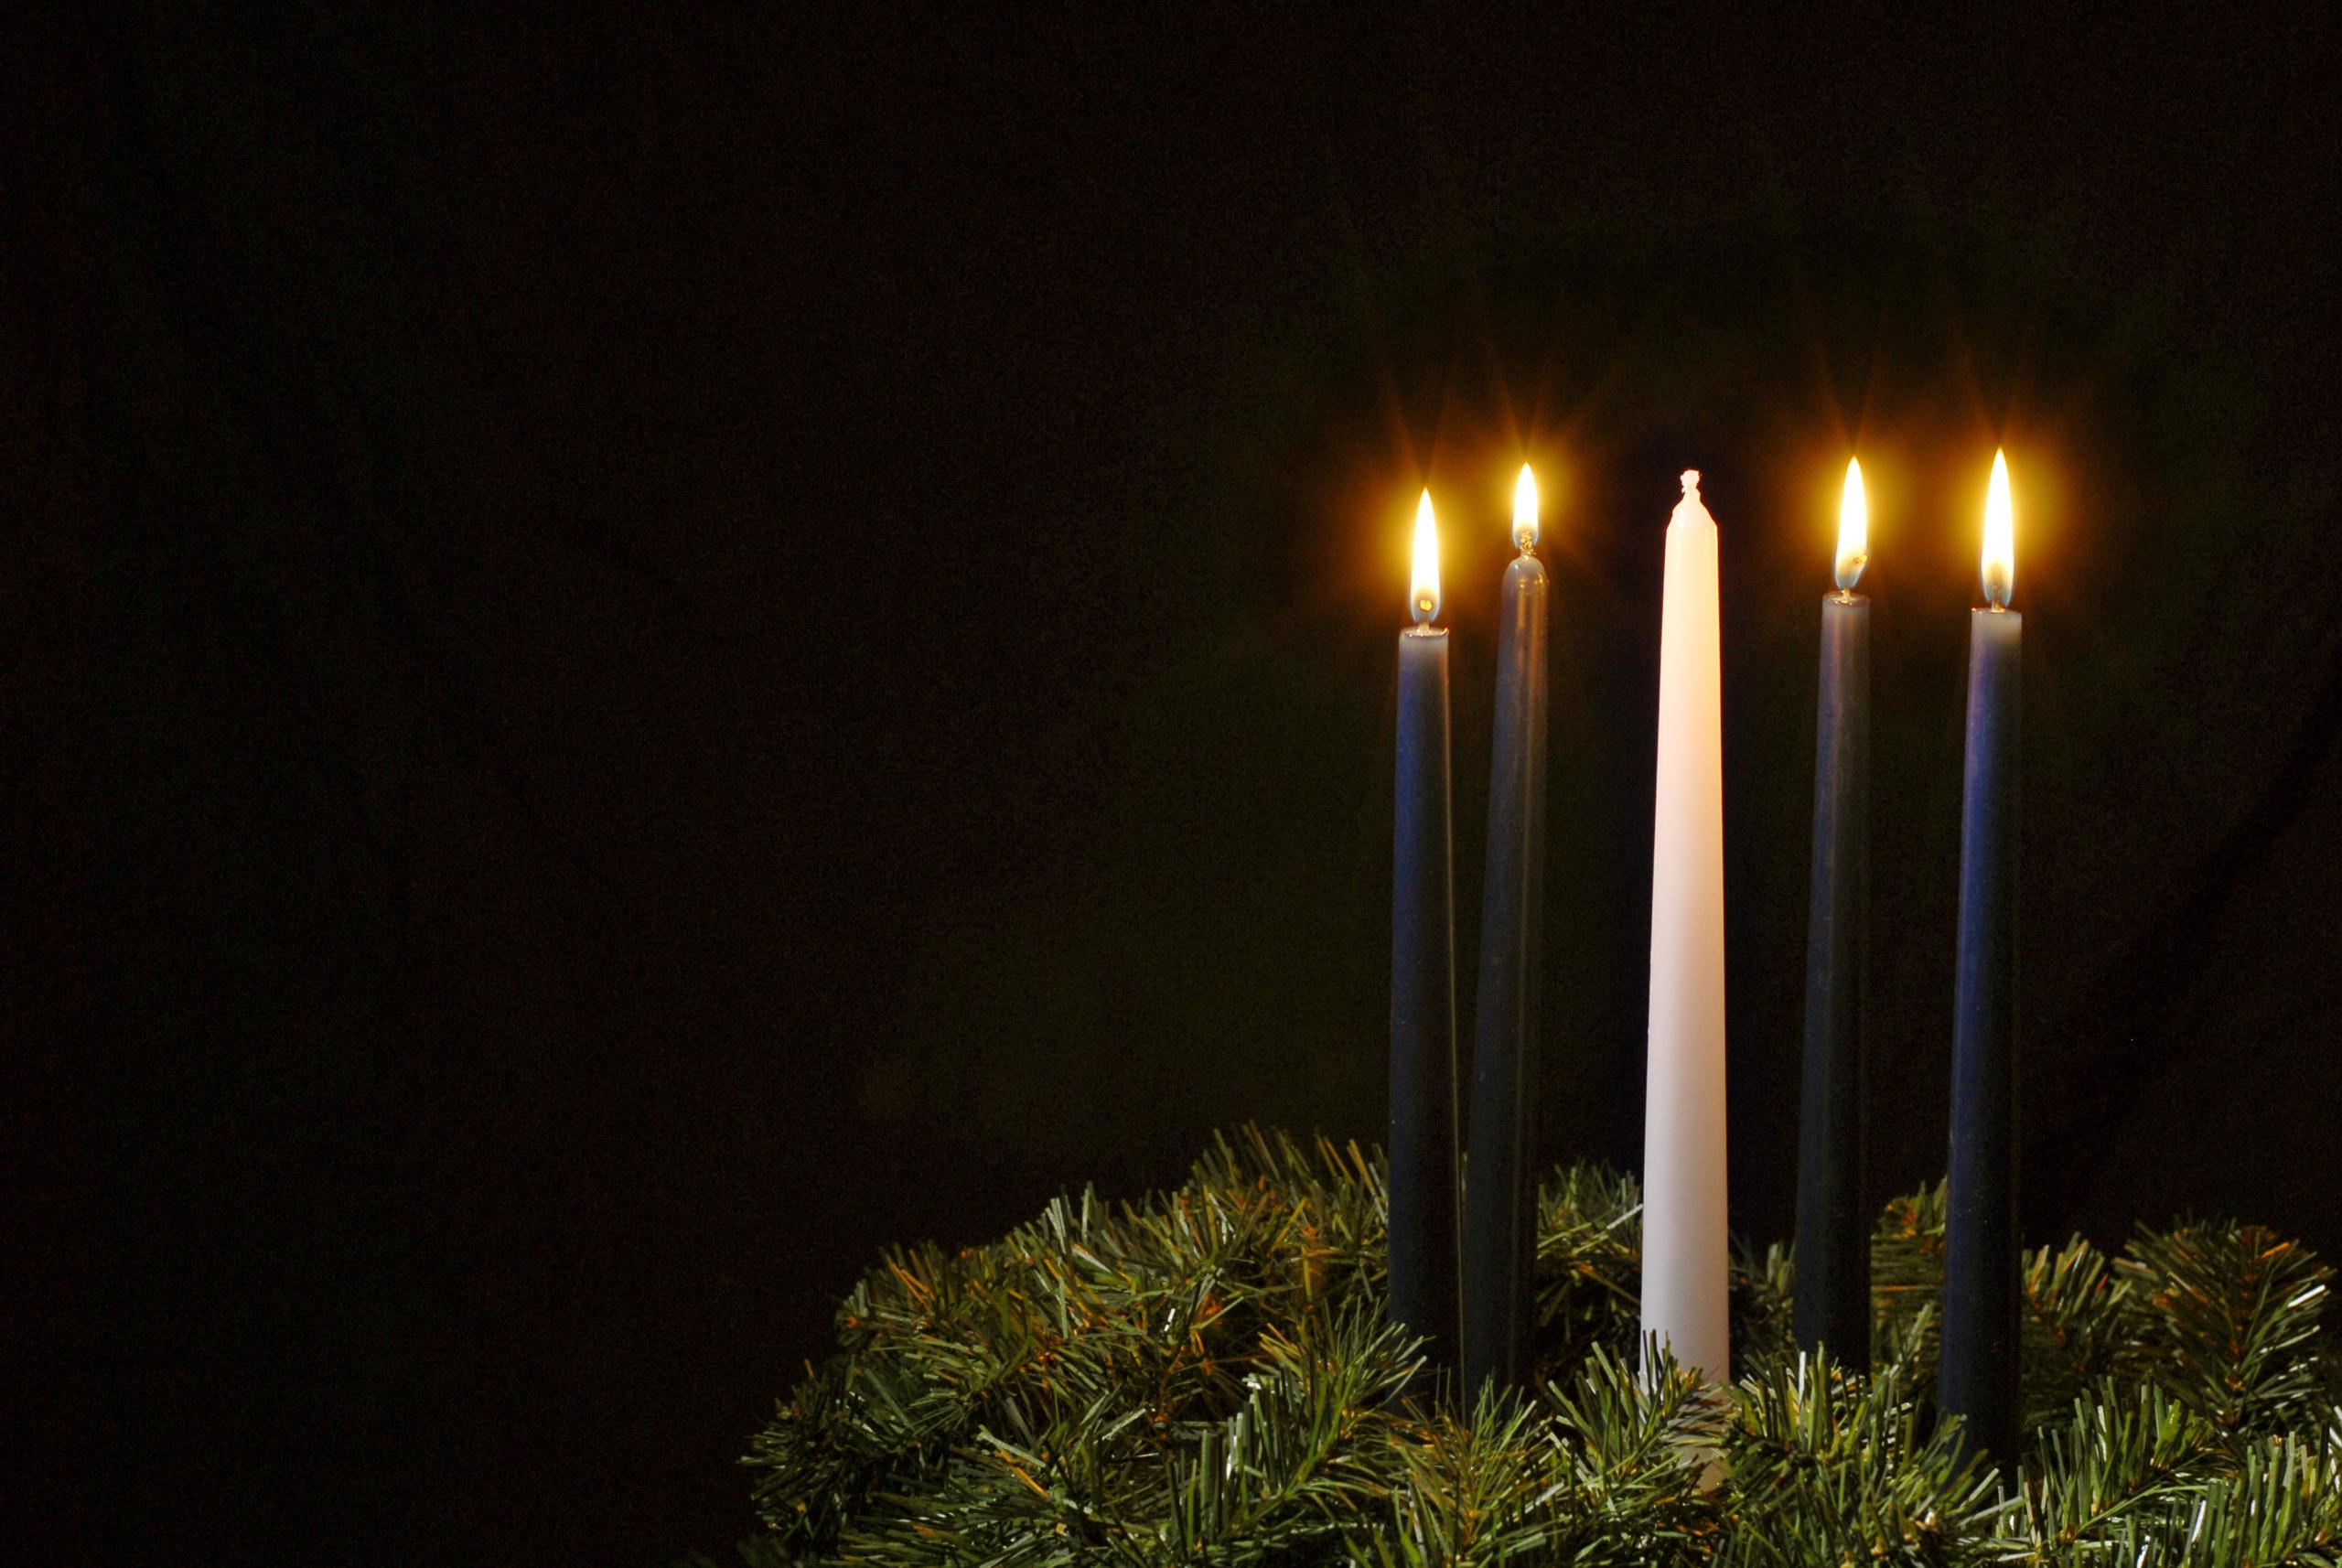 Celebrate the Gift of Jesus This Advent Season